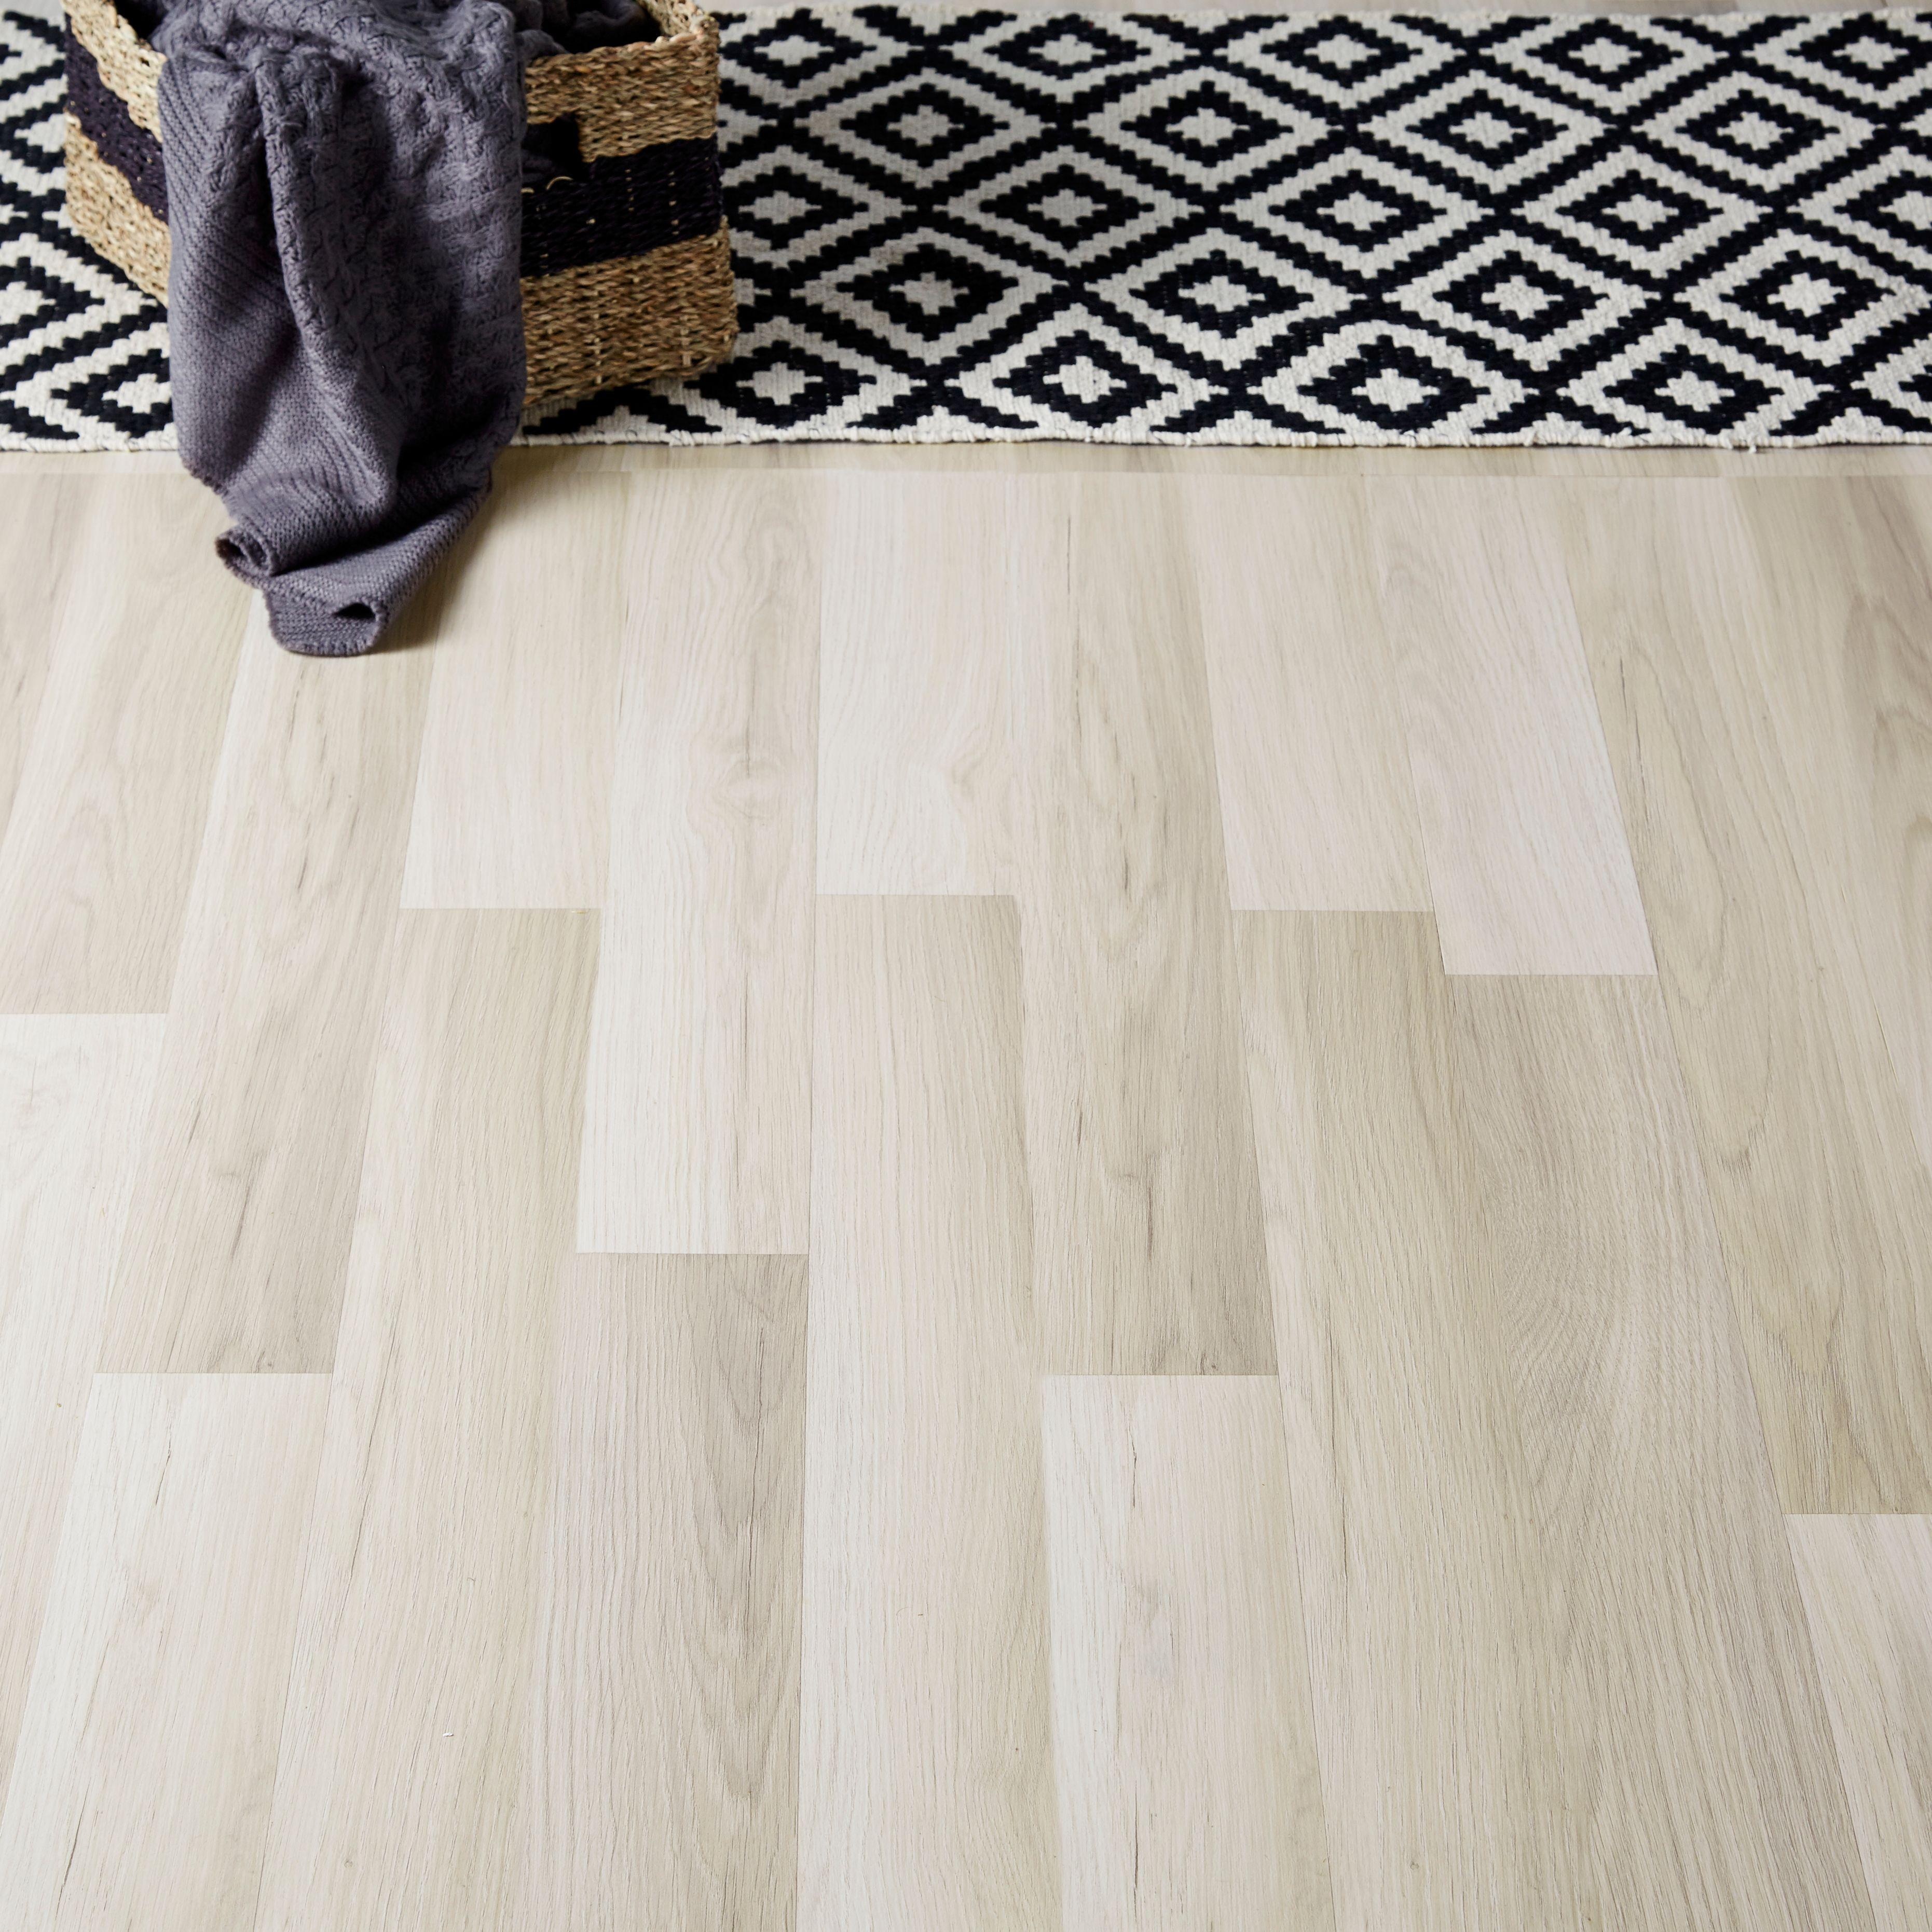 Townsville Grey Oak effect Laminate flooring sample